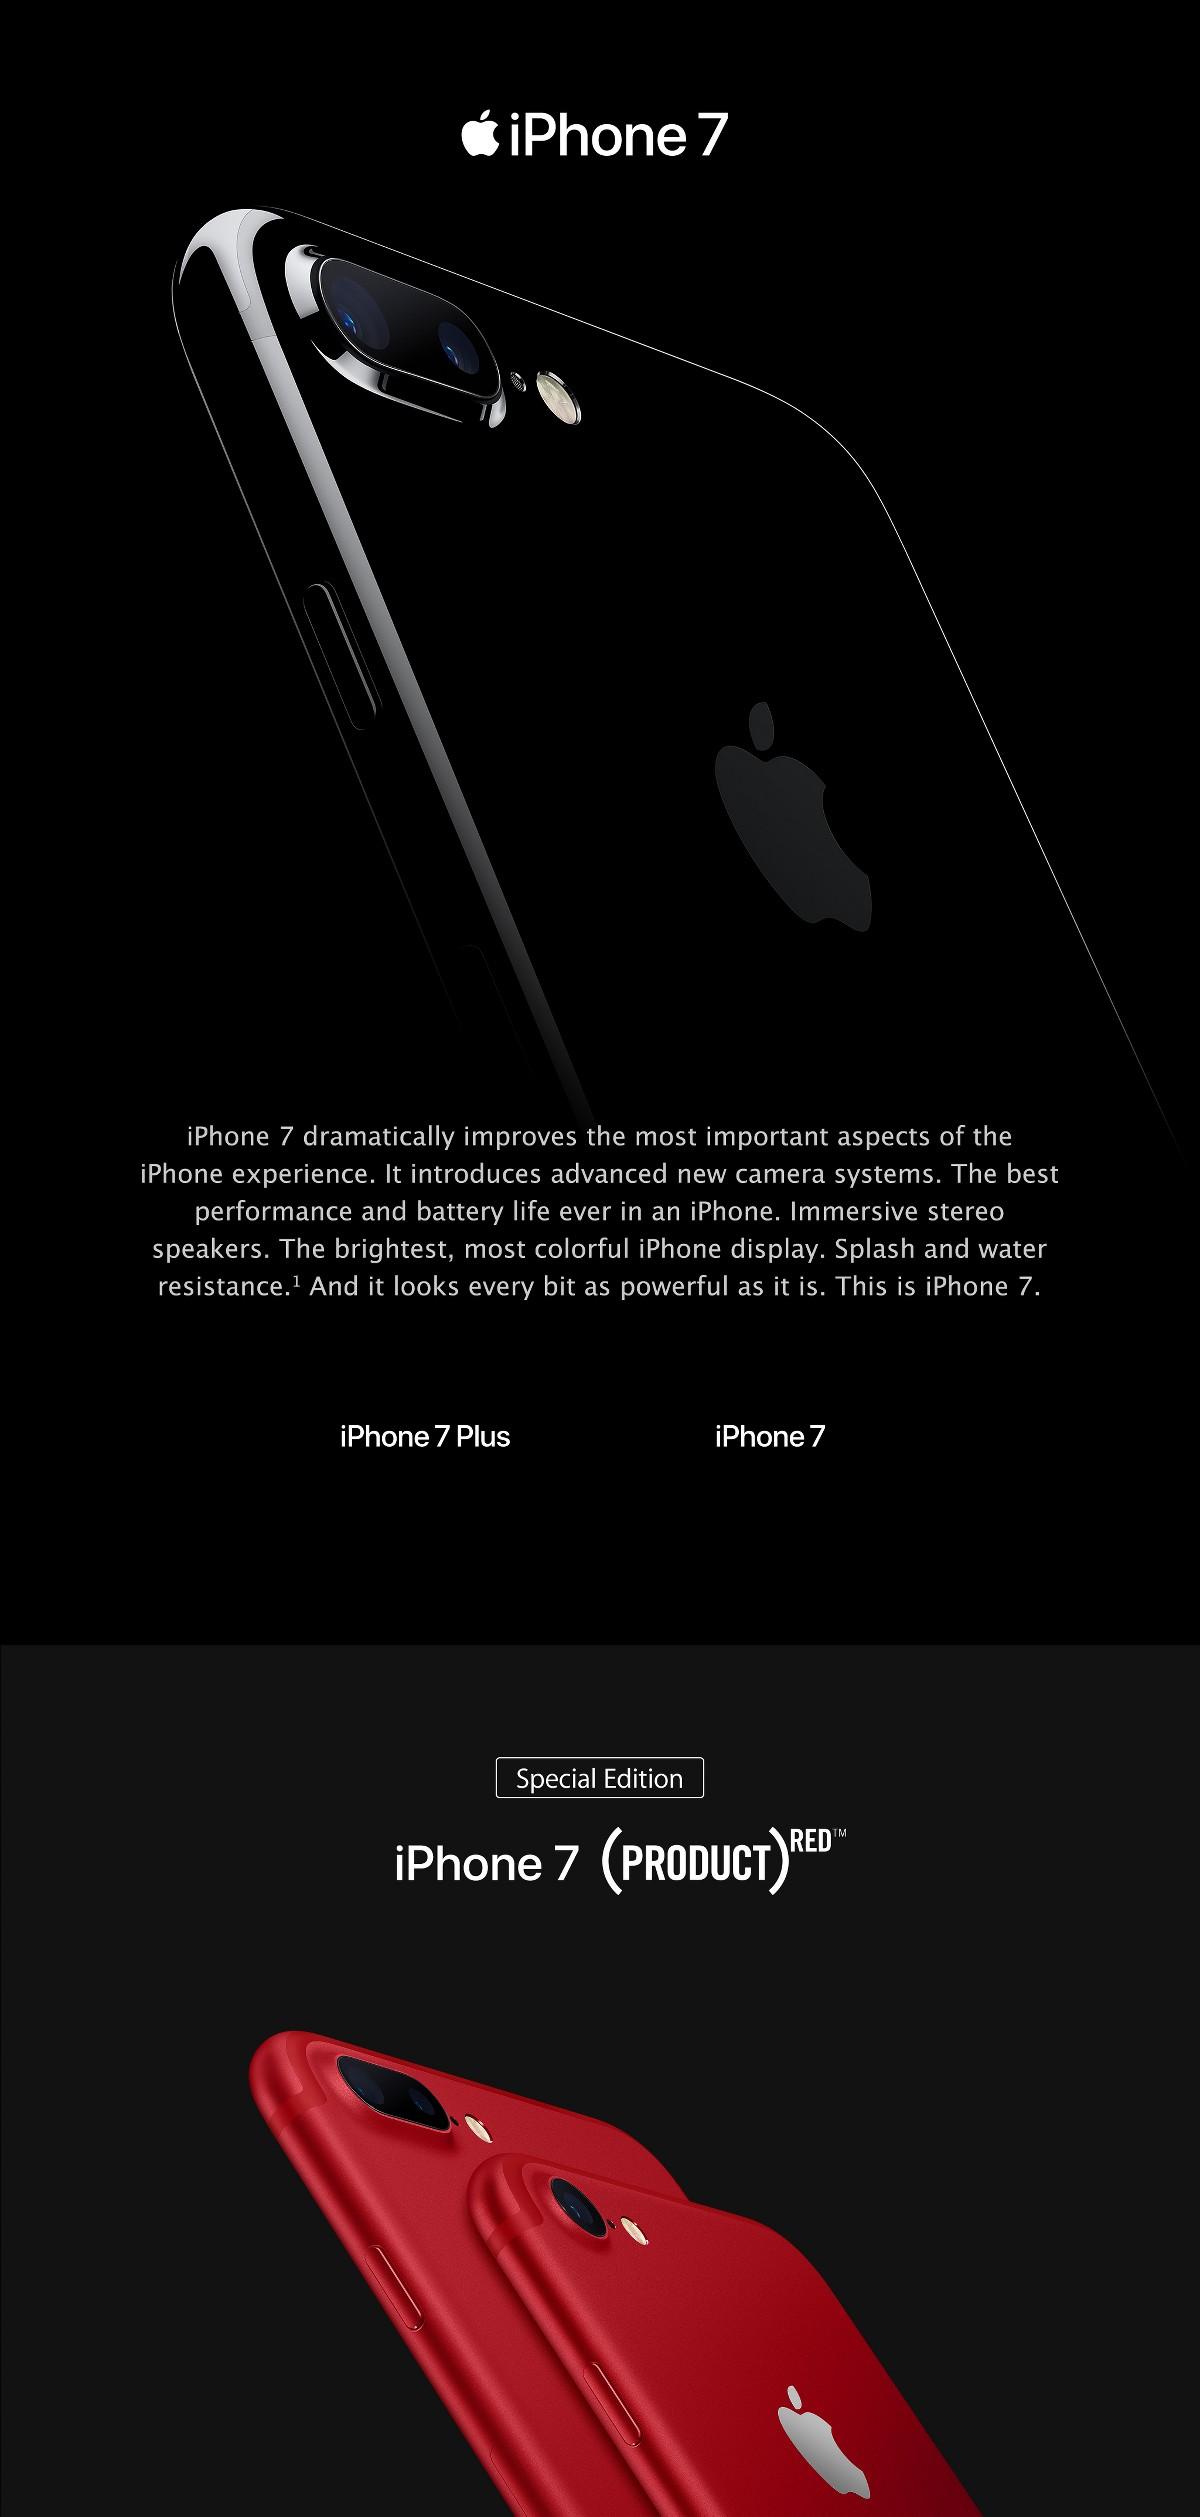 iphone 7 target